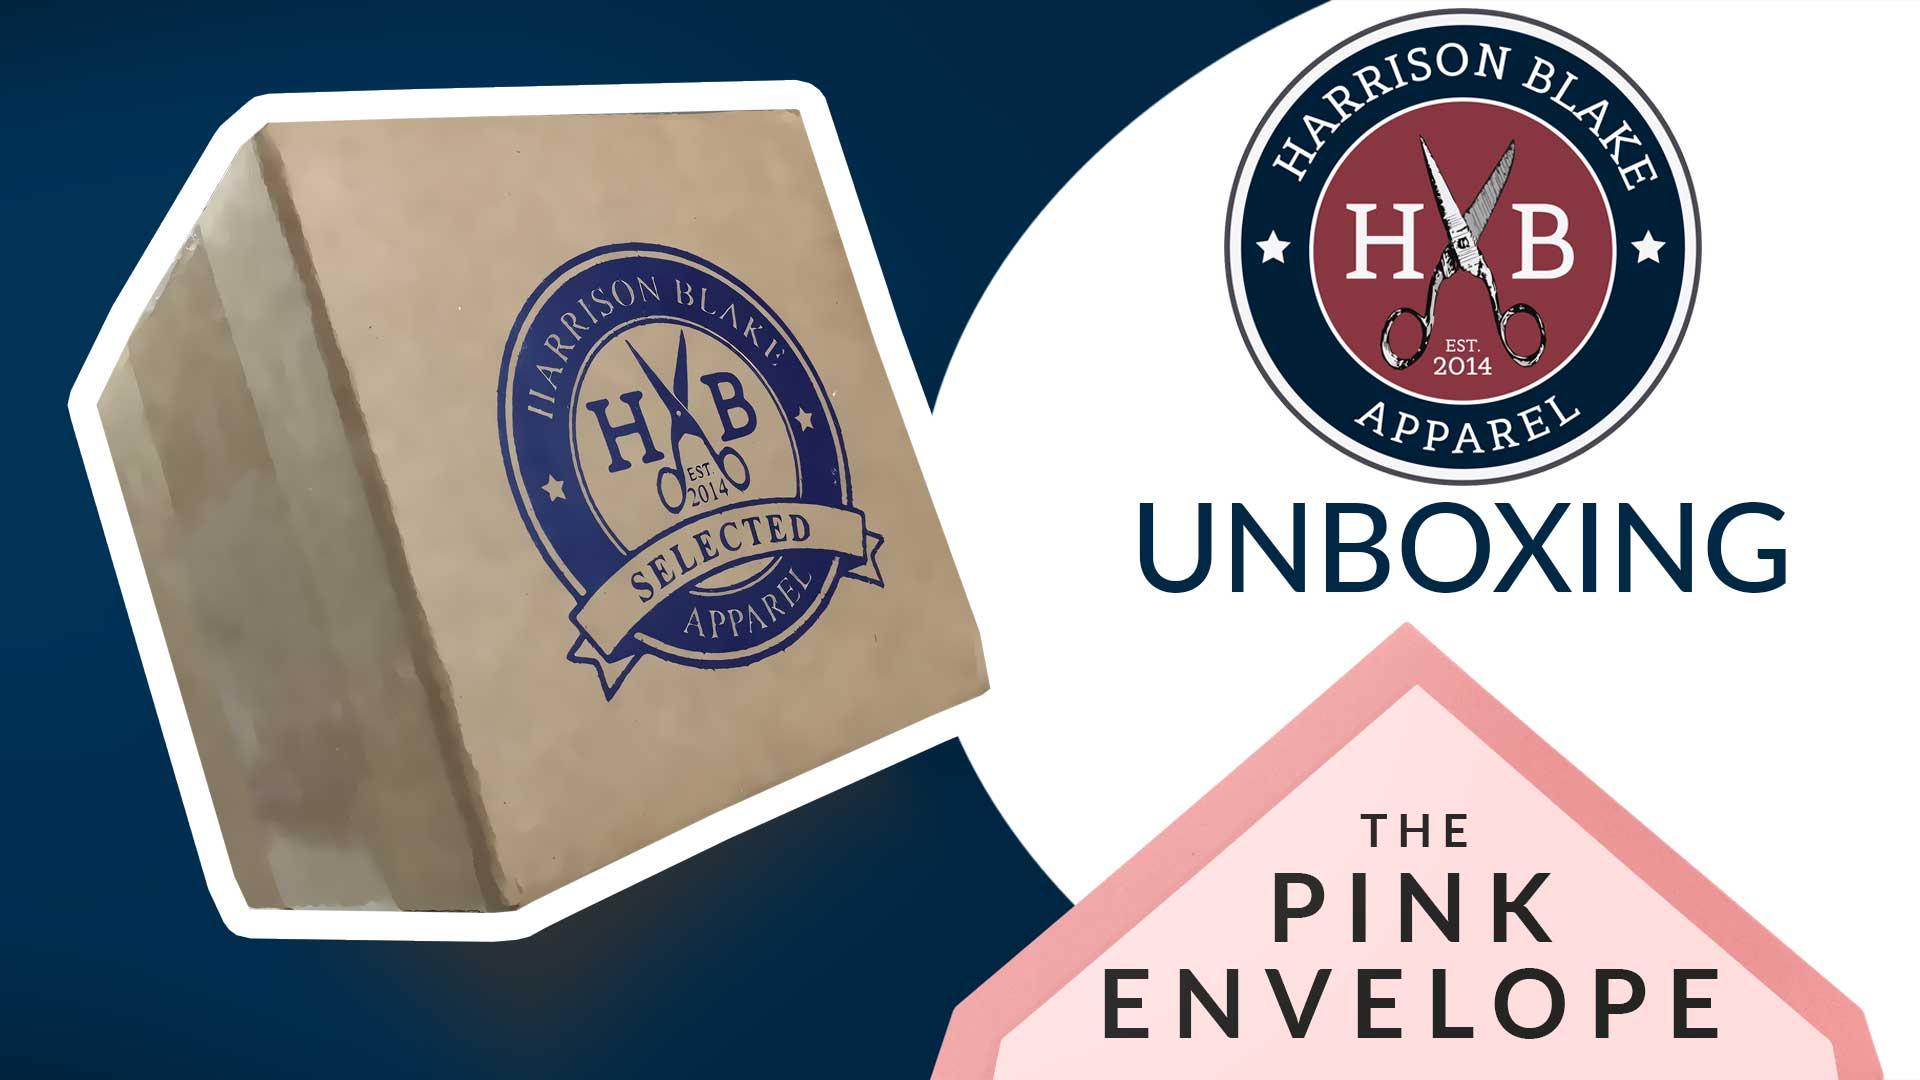 Mens Accessories Subscription Box – Harrison Blake Apparel